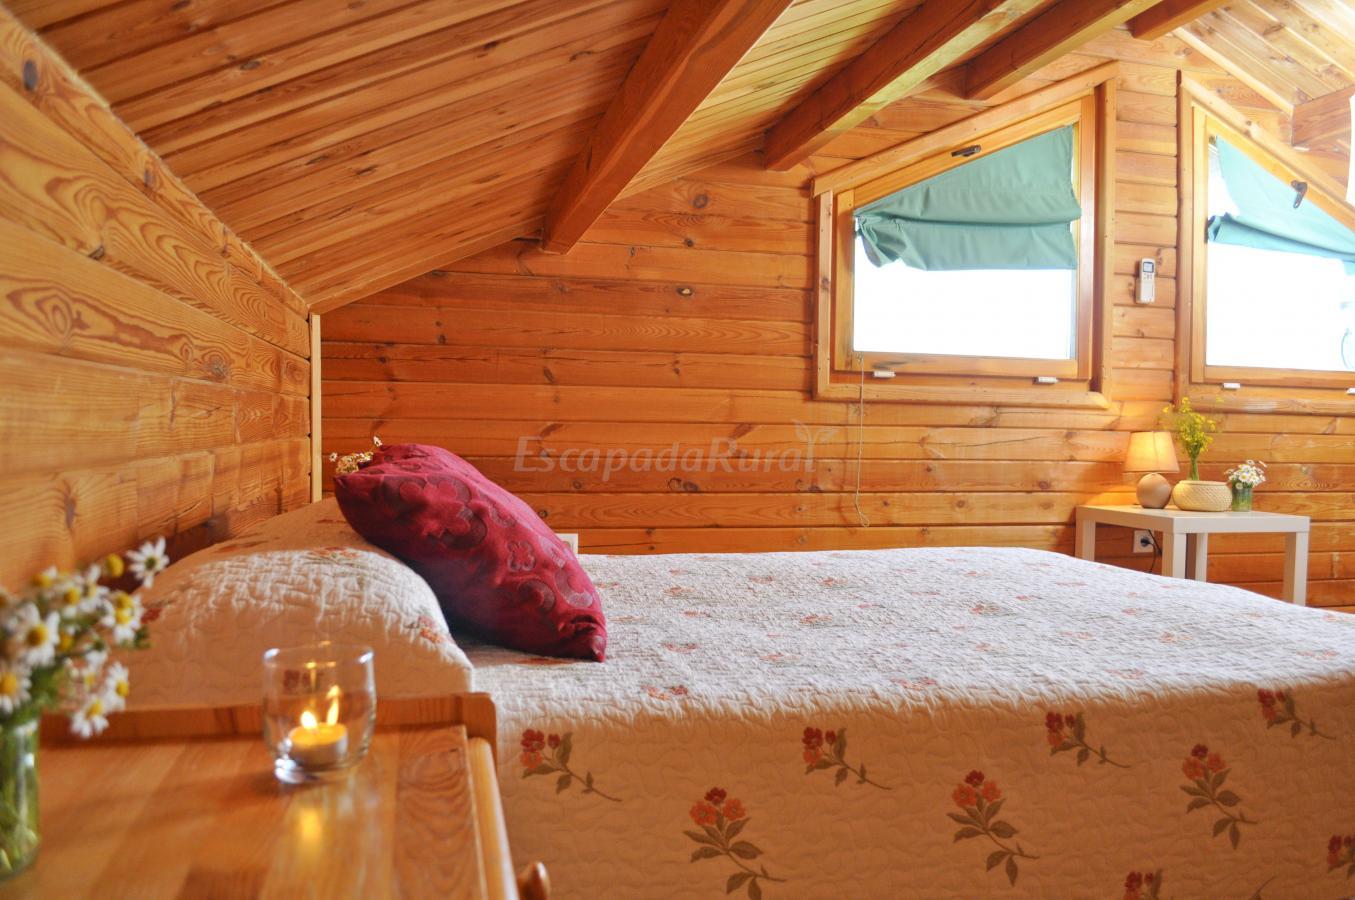 Fotos de recinto rural caba as de madera tabla honda - Casas con buhardilla ...